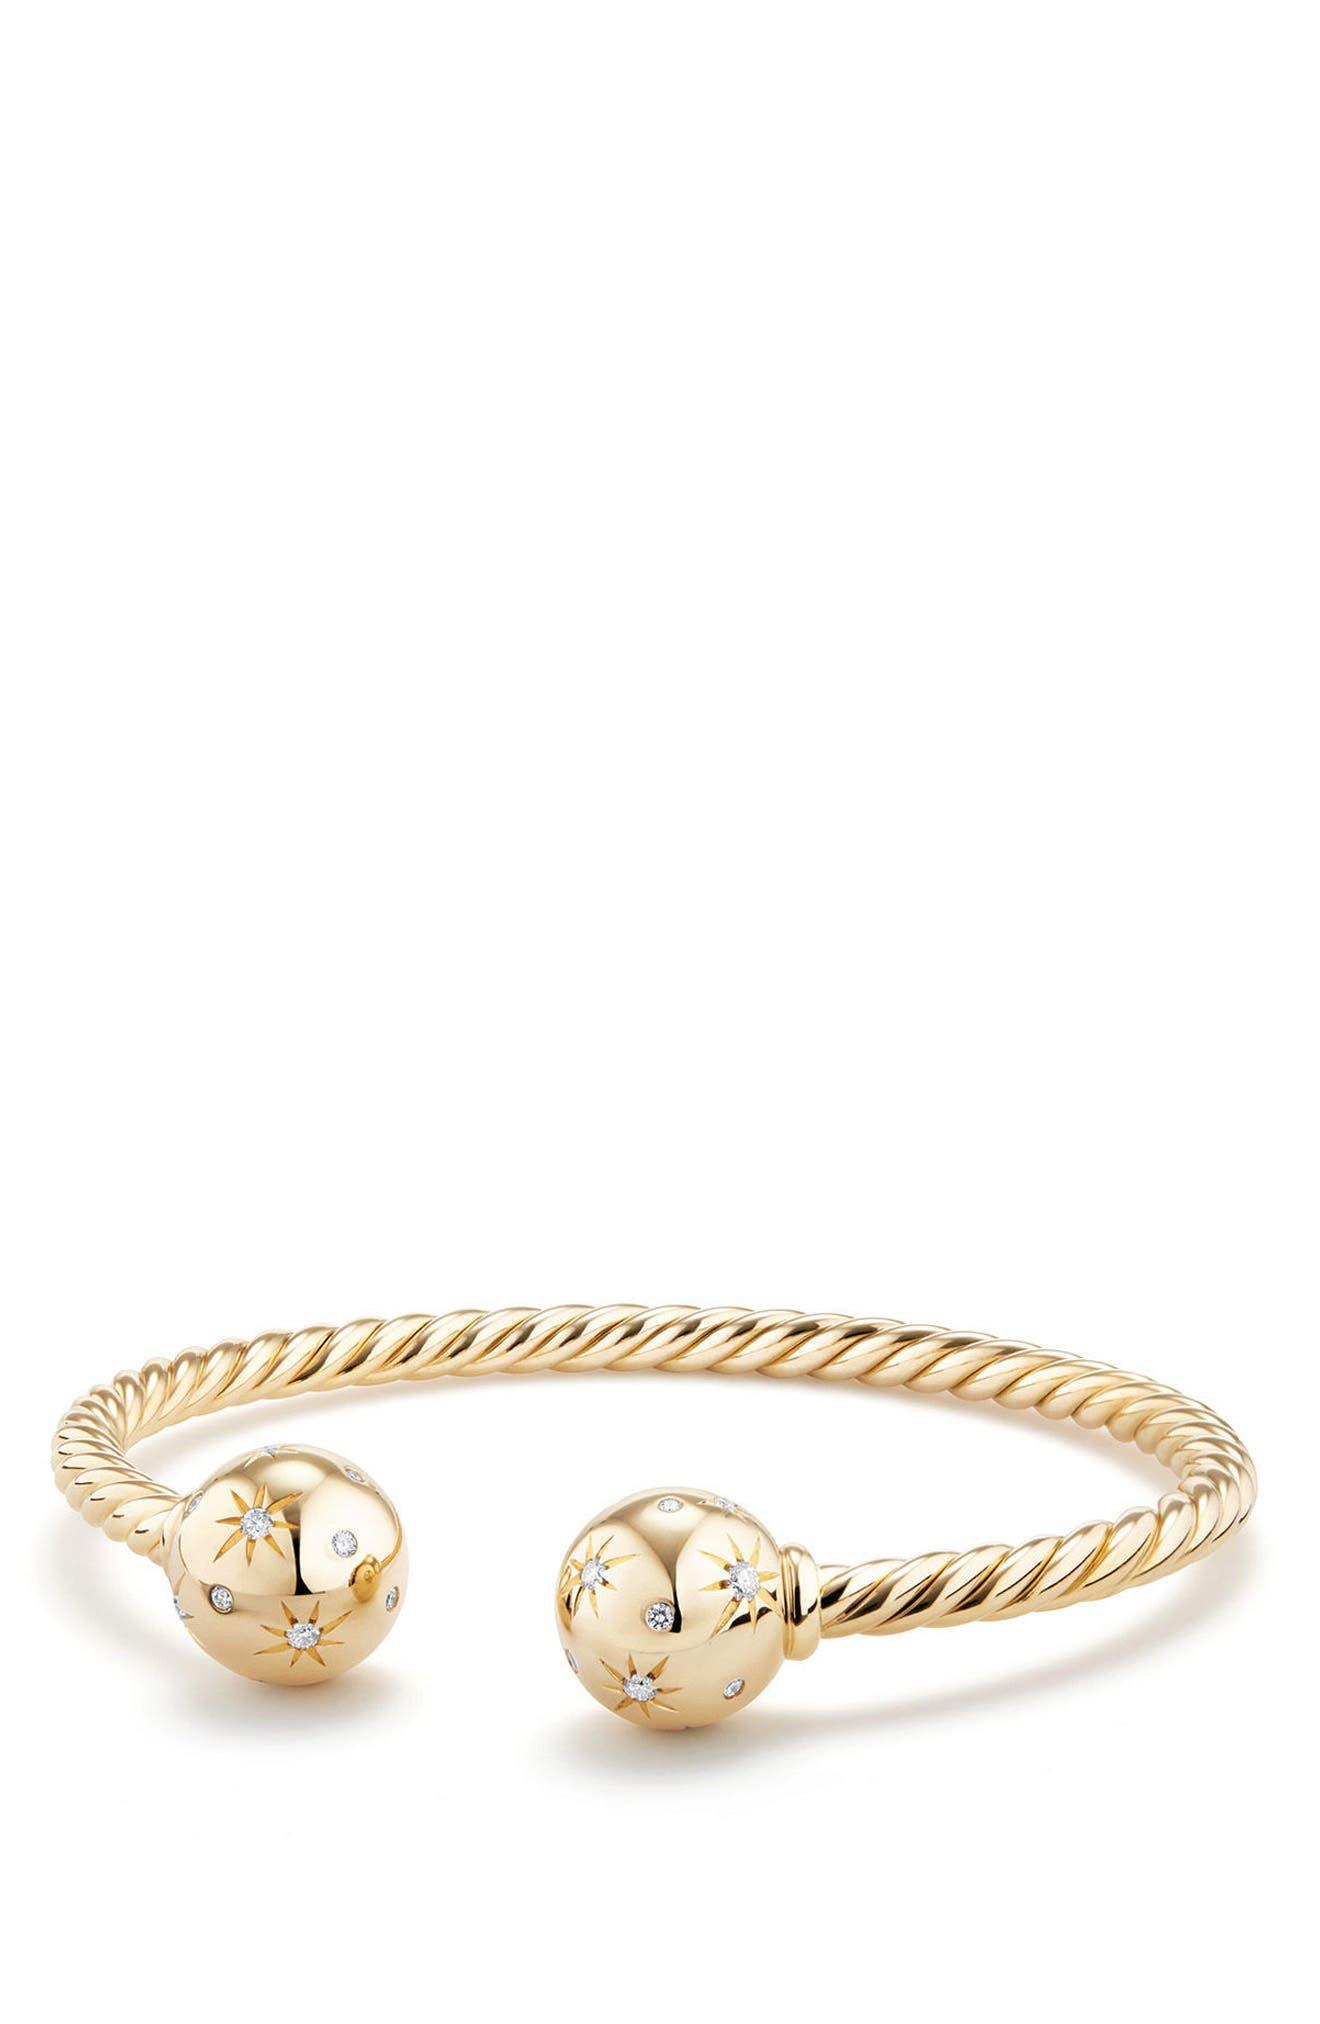 Main Image - David Yurman Solari Bead Bracelet with Diamonds in 18K Gold